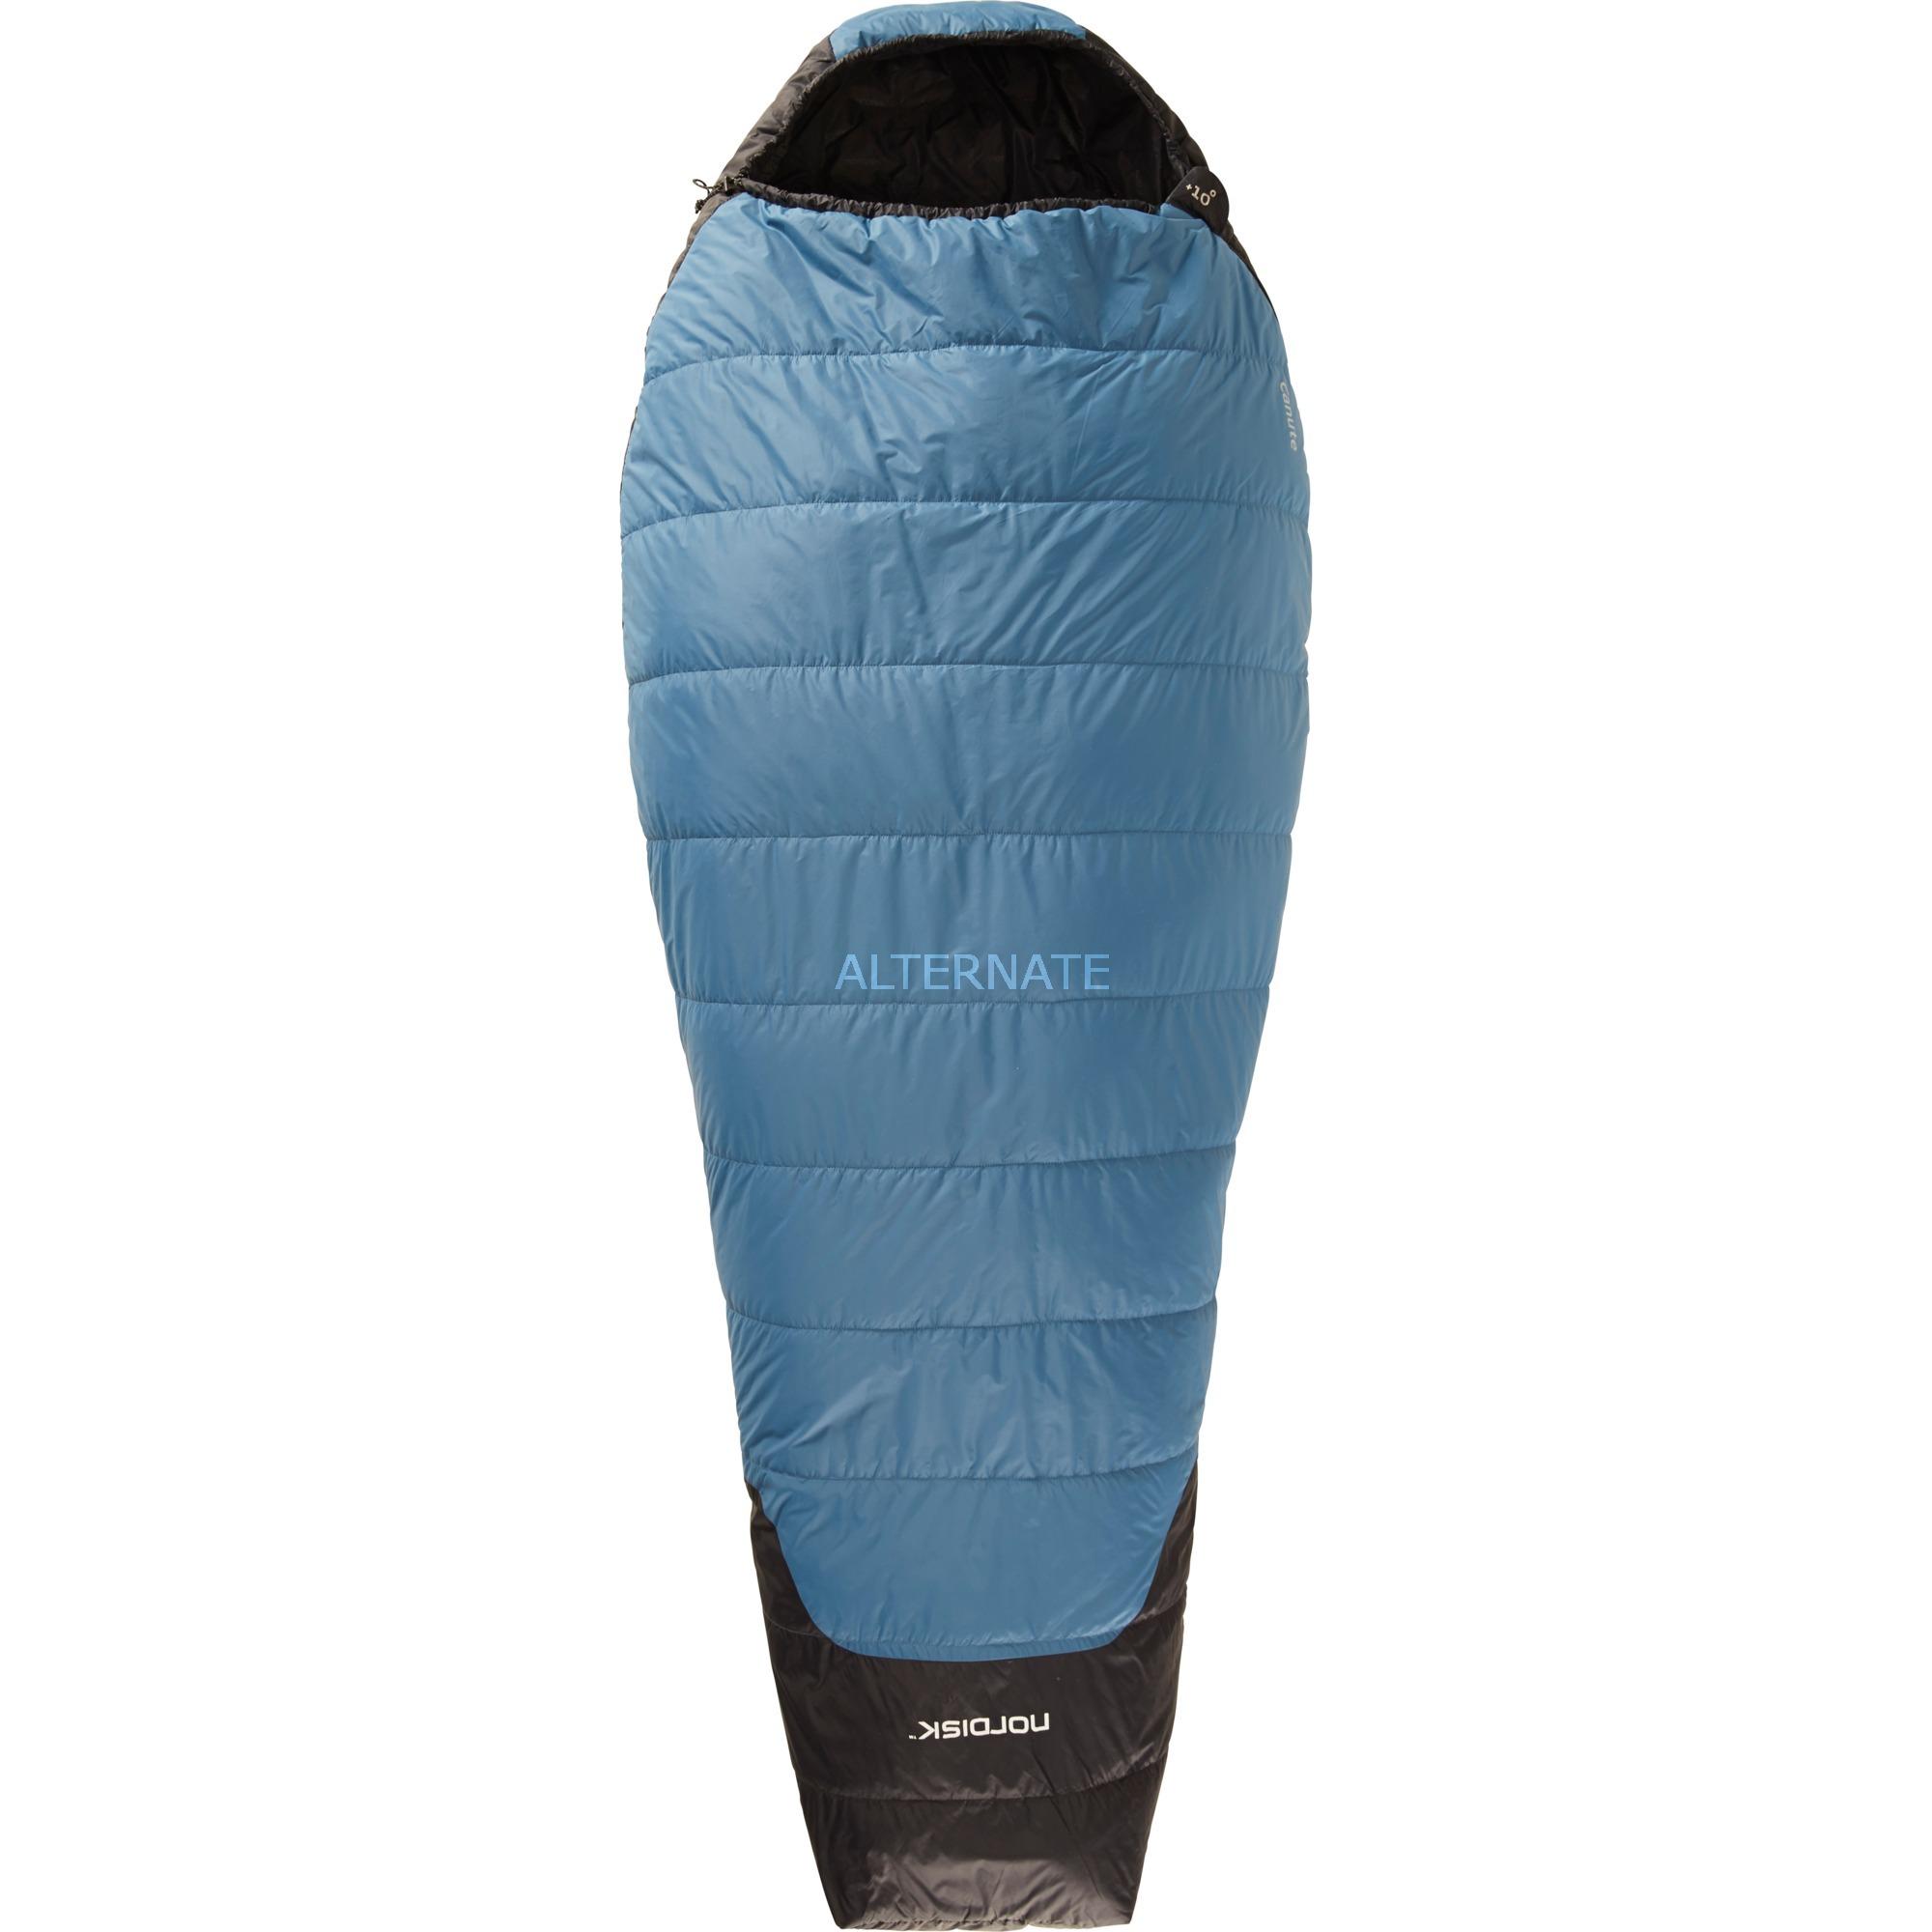 Canute +10° L Sleeping Bag, Saco de dormir